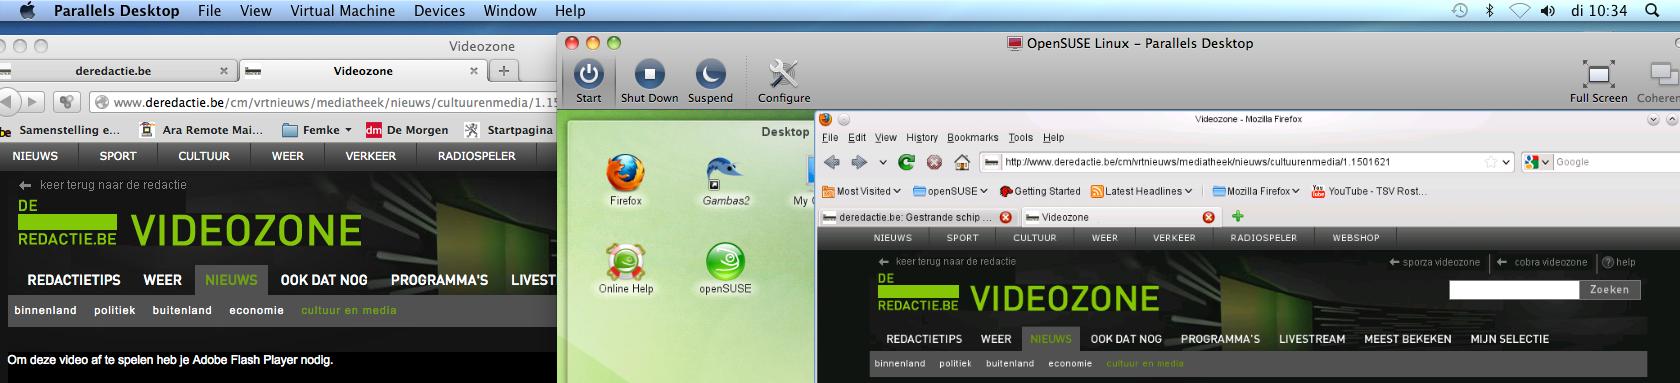 ParallelsDesktop op Mac draait Linux